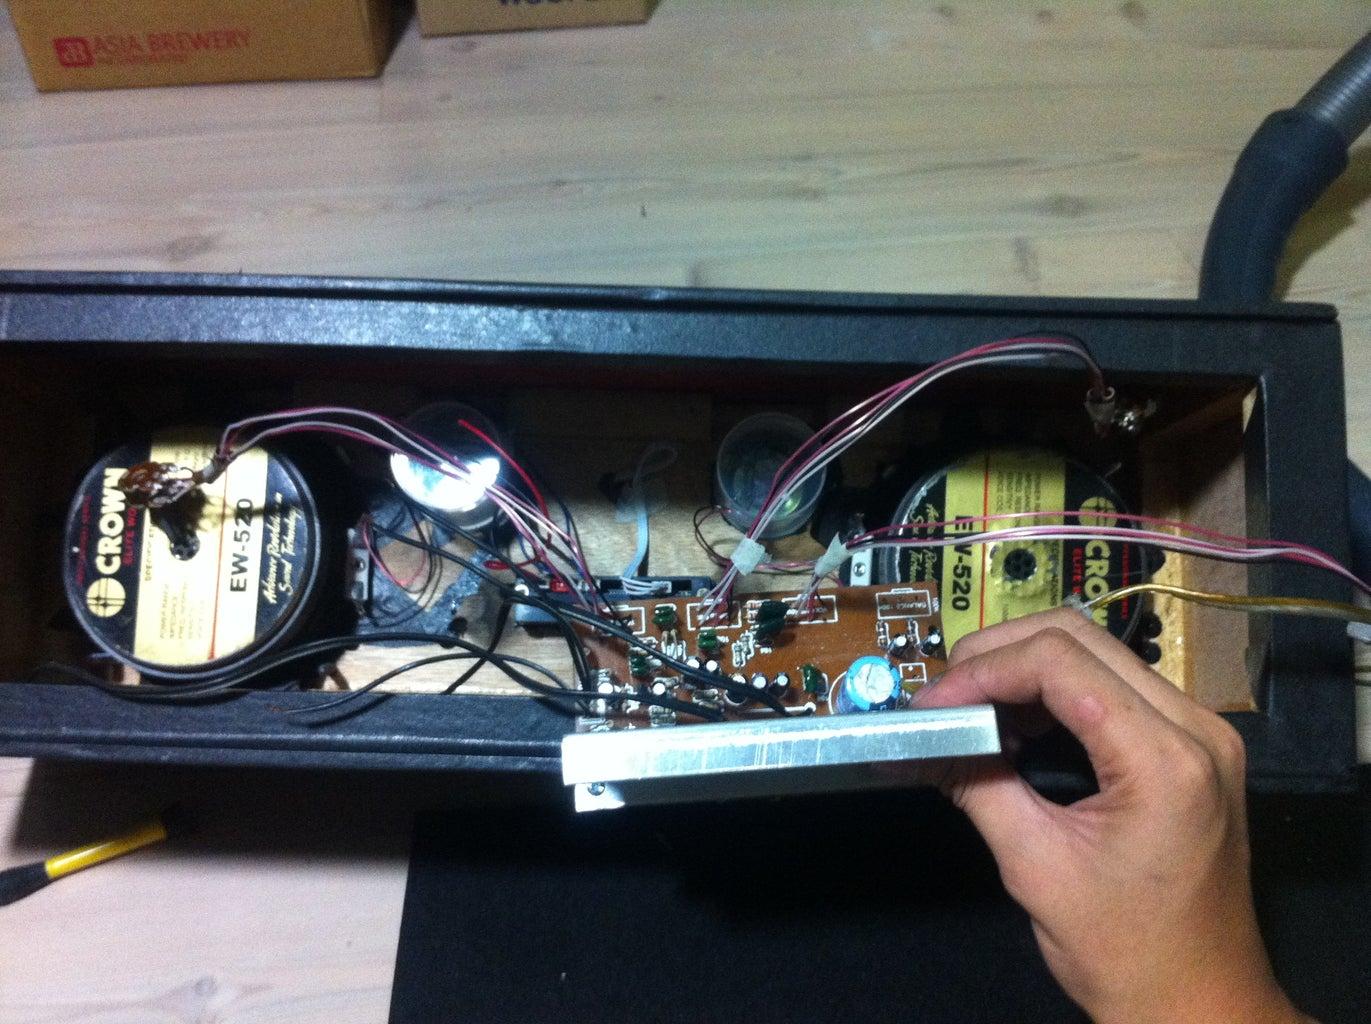 Assembling the Boombox